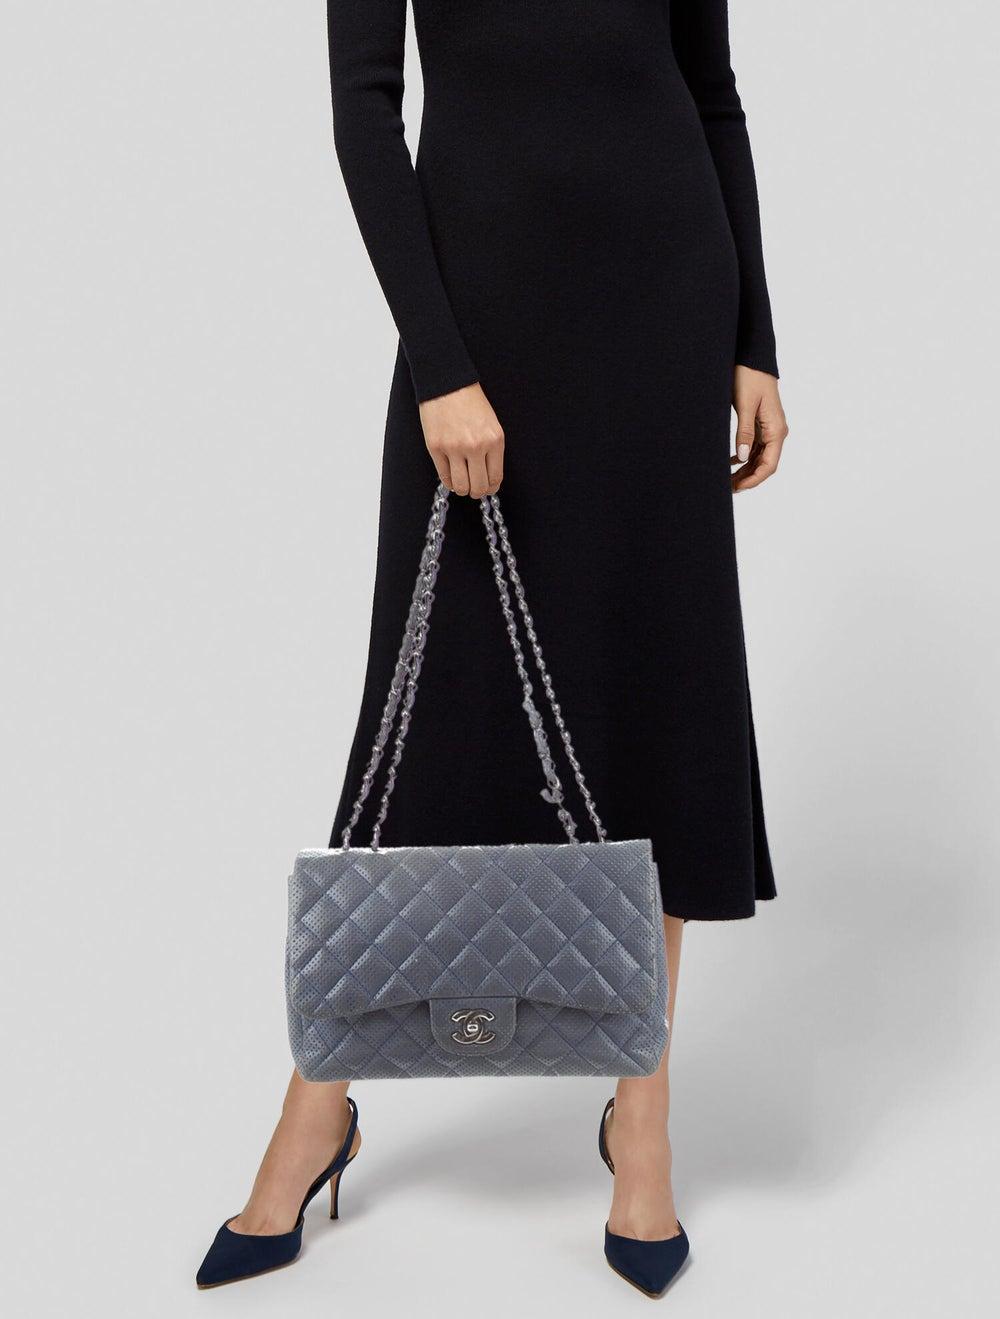 Chanel Classic Jumbo Single Flap Bag Blue - image 2